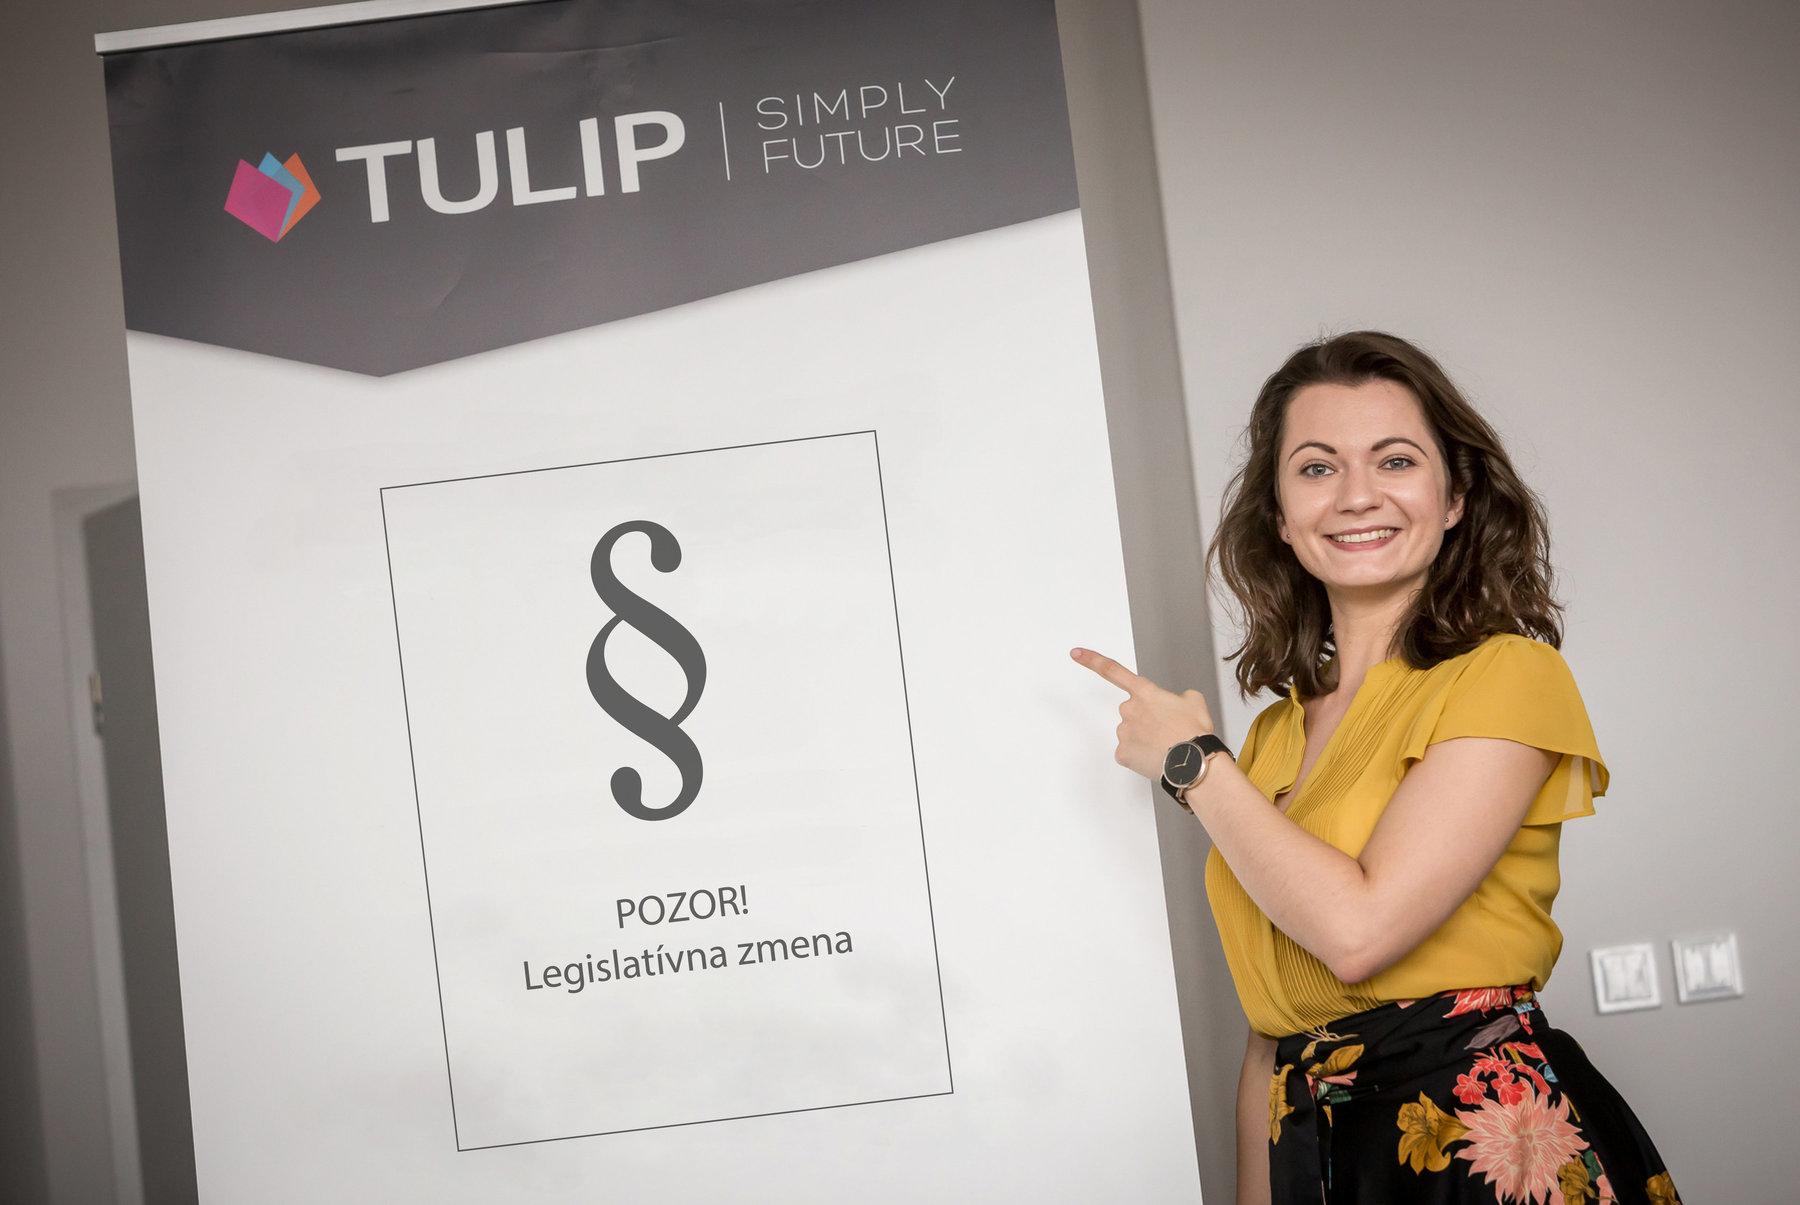 prinasame vam informacie o zmenach legislativy - TULIP blog